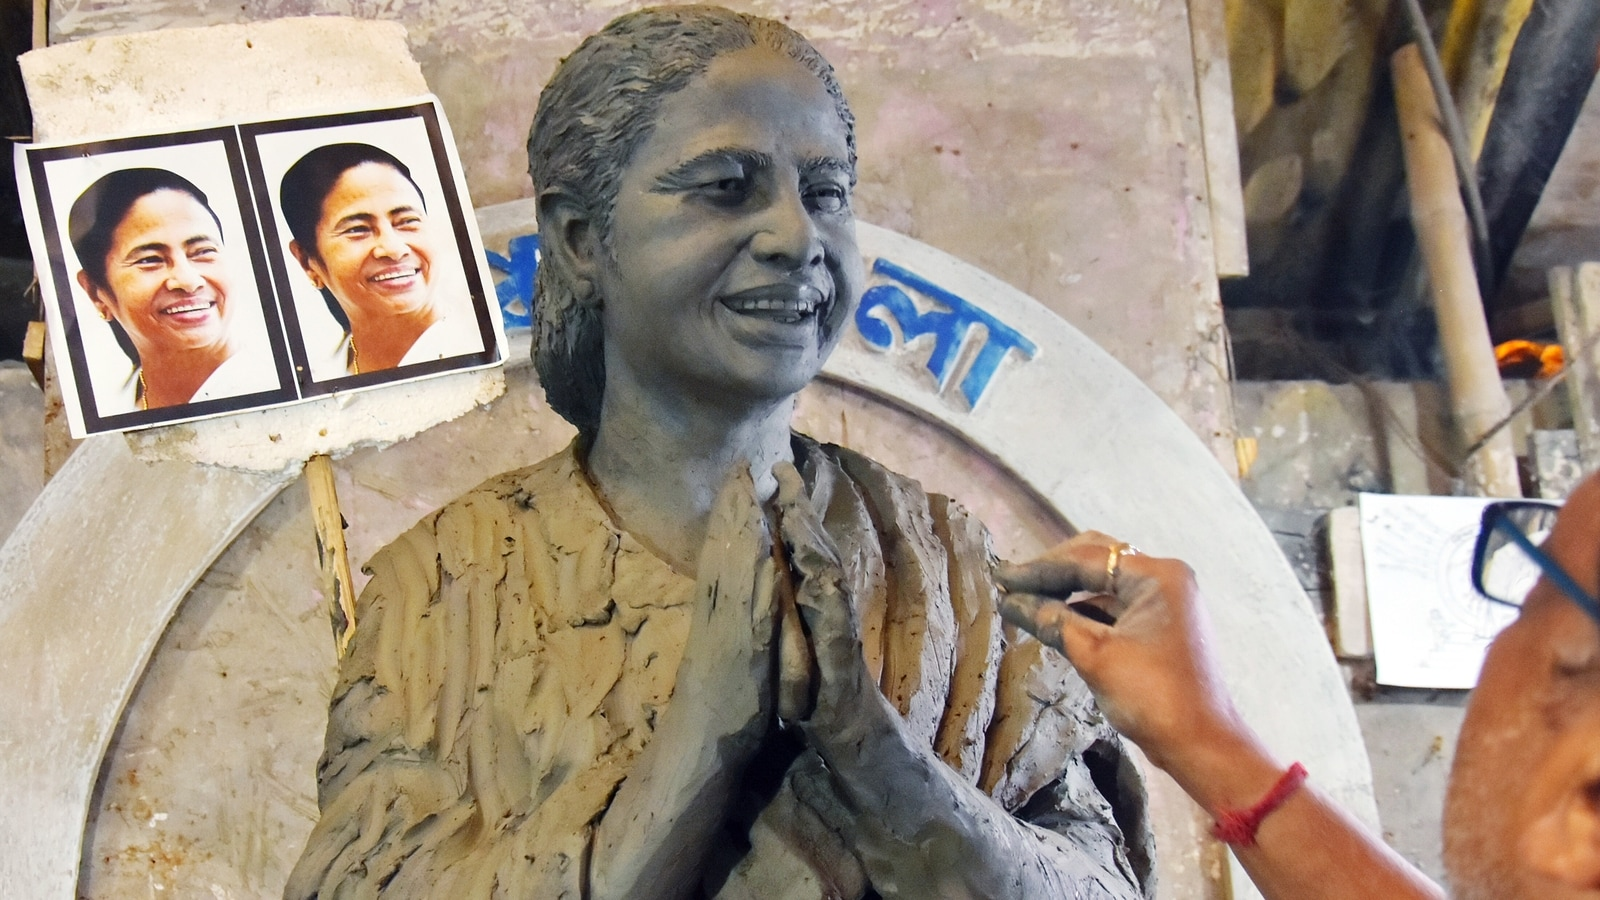 Congress will think 'afresh' on fielding candidate opposite Mamata Banerjee in bypolls: Adhir Ranjan Chowdhury